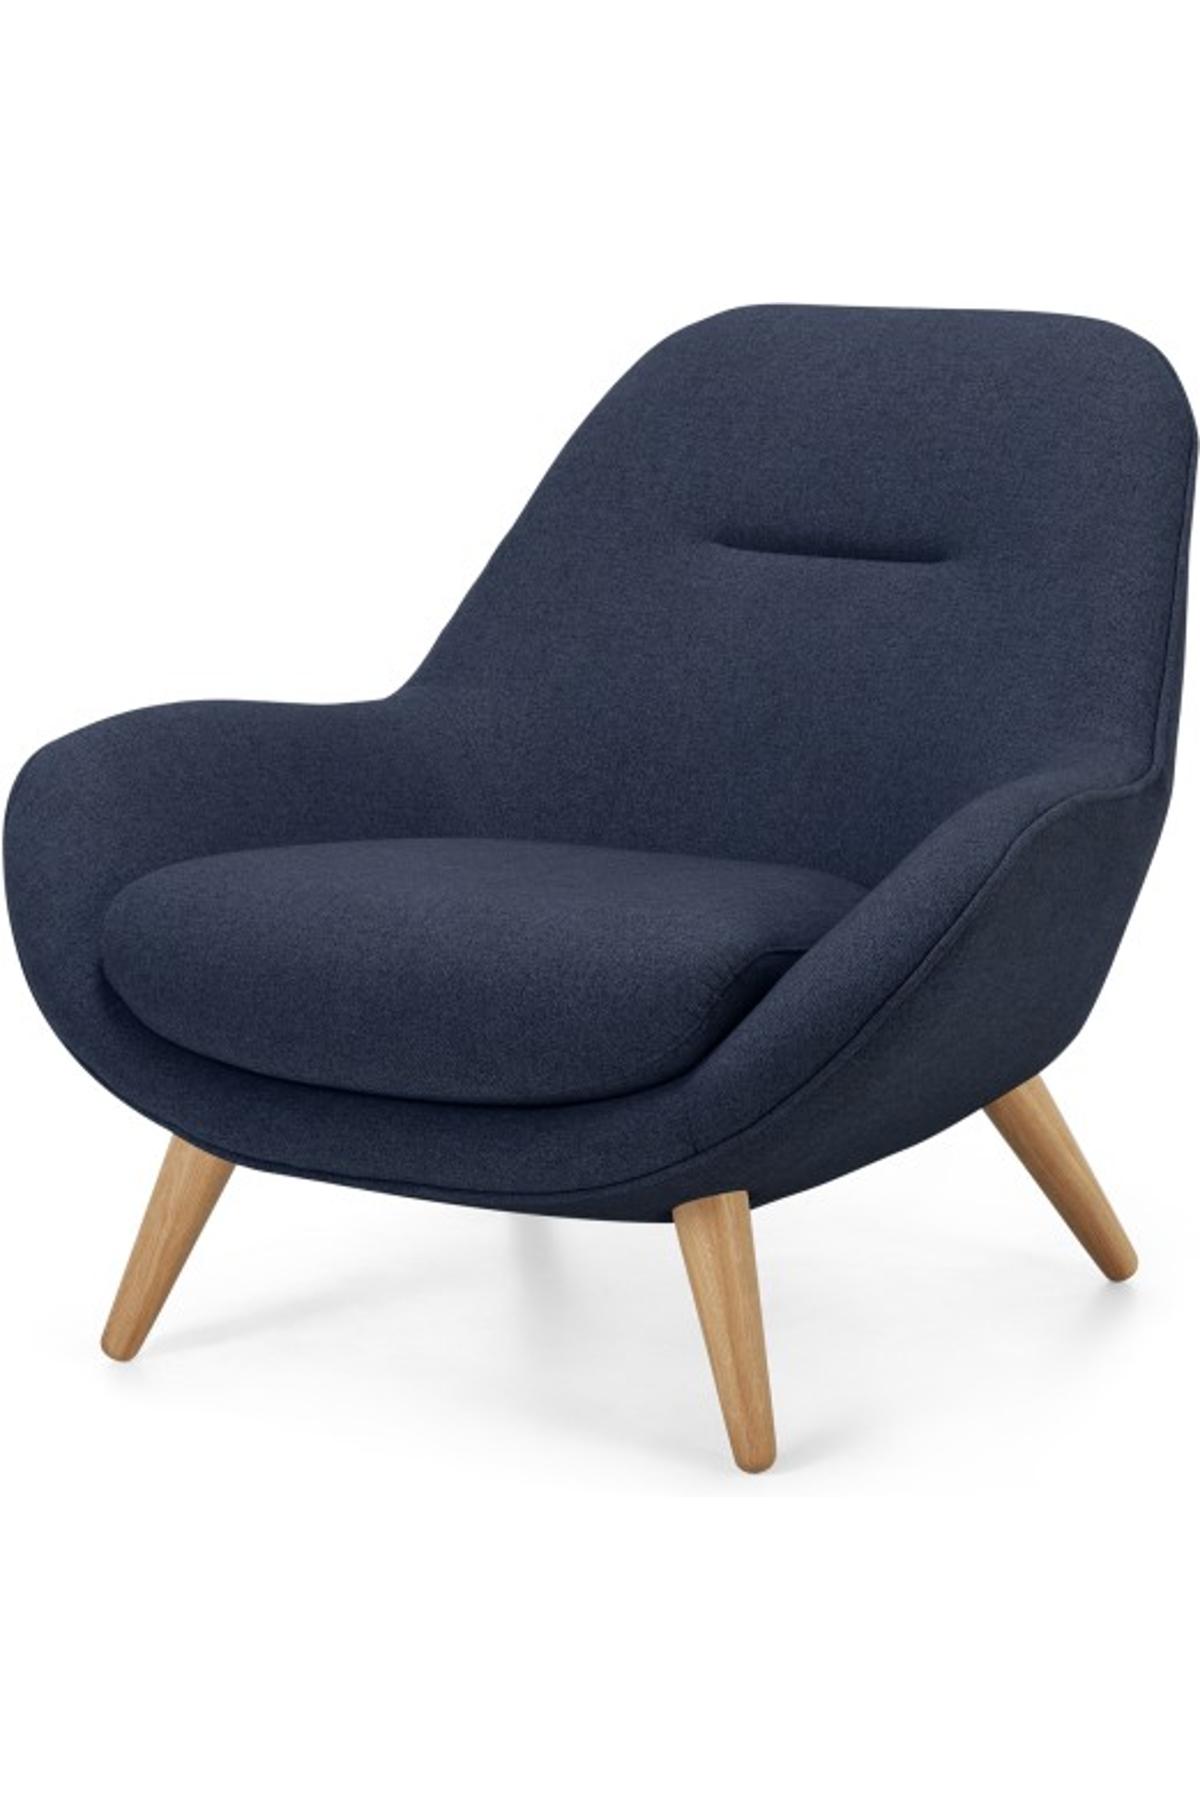 Best Karmello Accent Armchair Flavio Blue Accent Arm Chairs 400 x 300